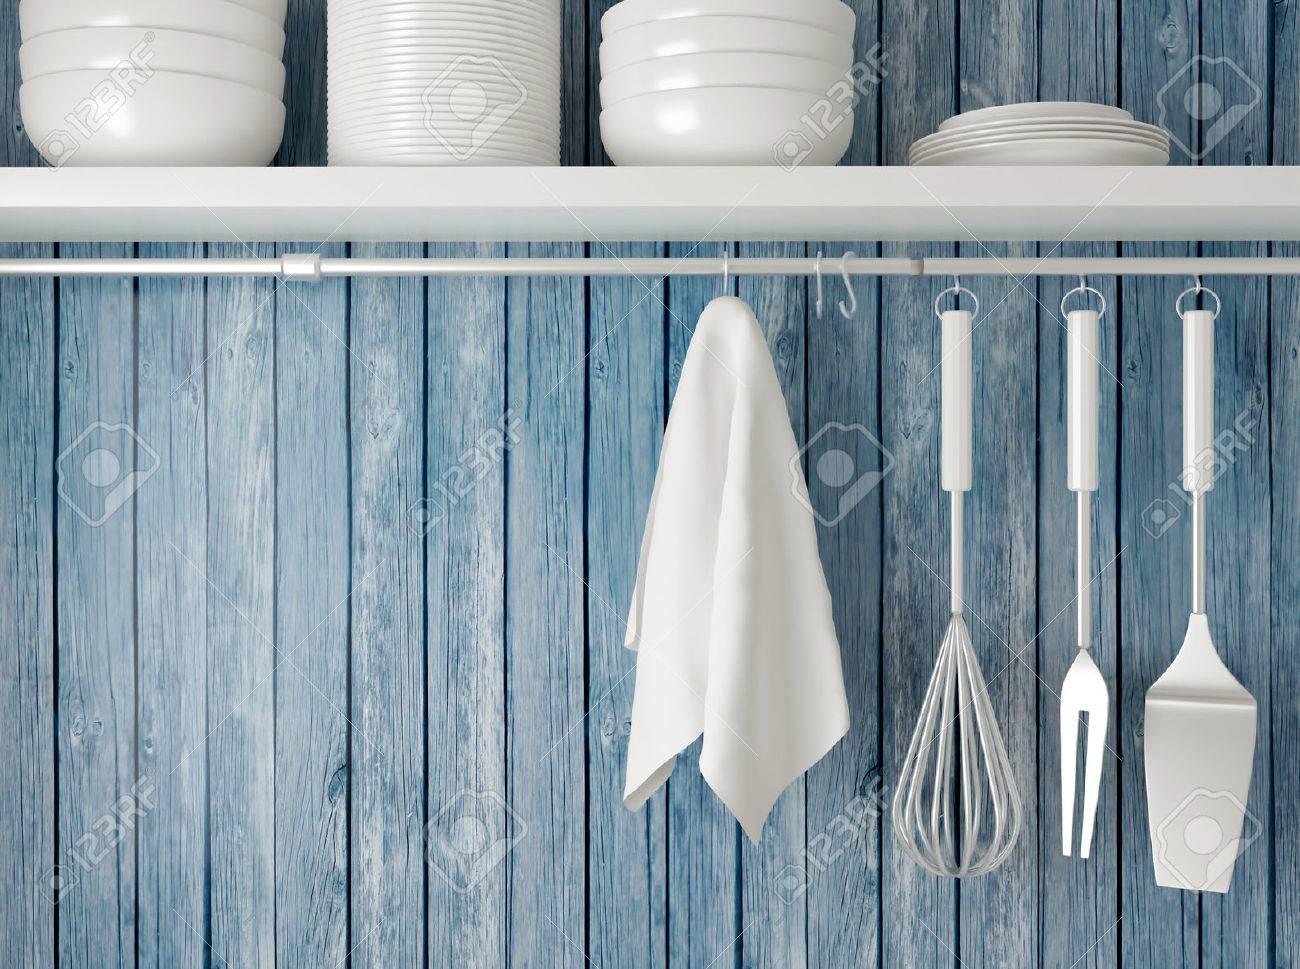 White Plates On The Shelf, Kitchen Cooking Utensils. Steel Spatulas ...